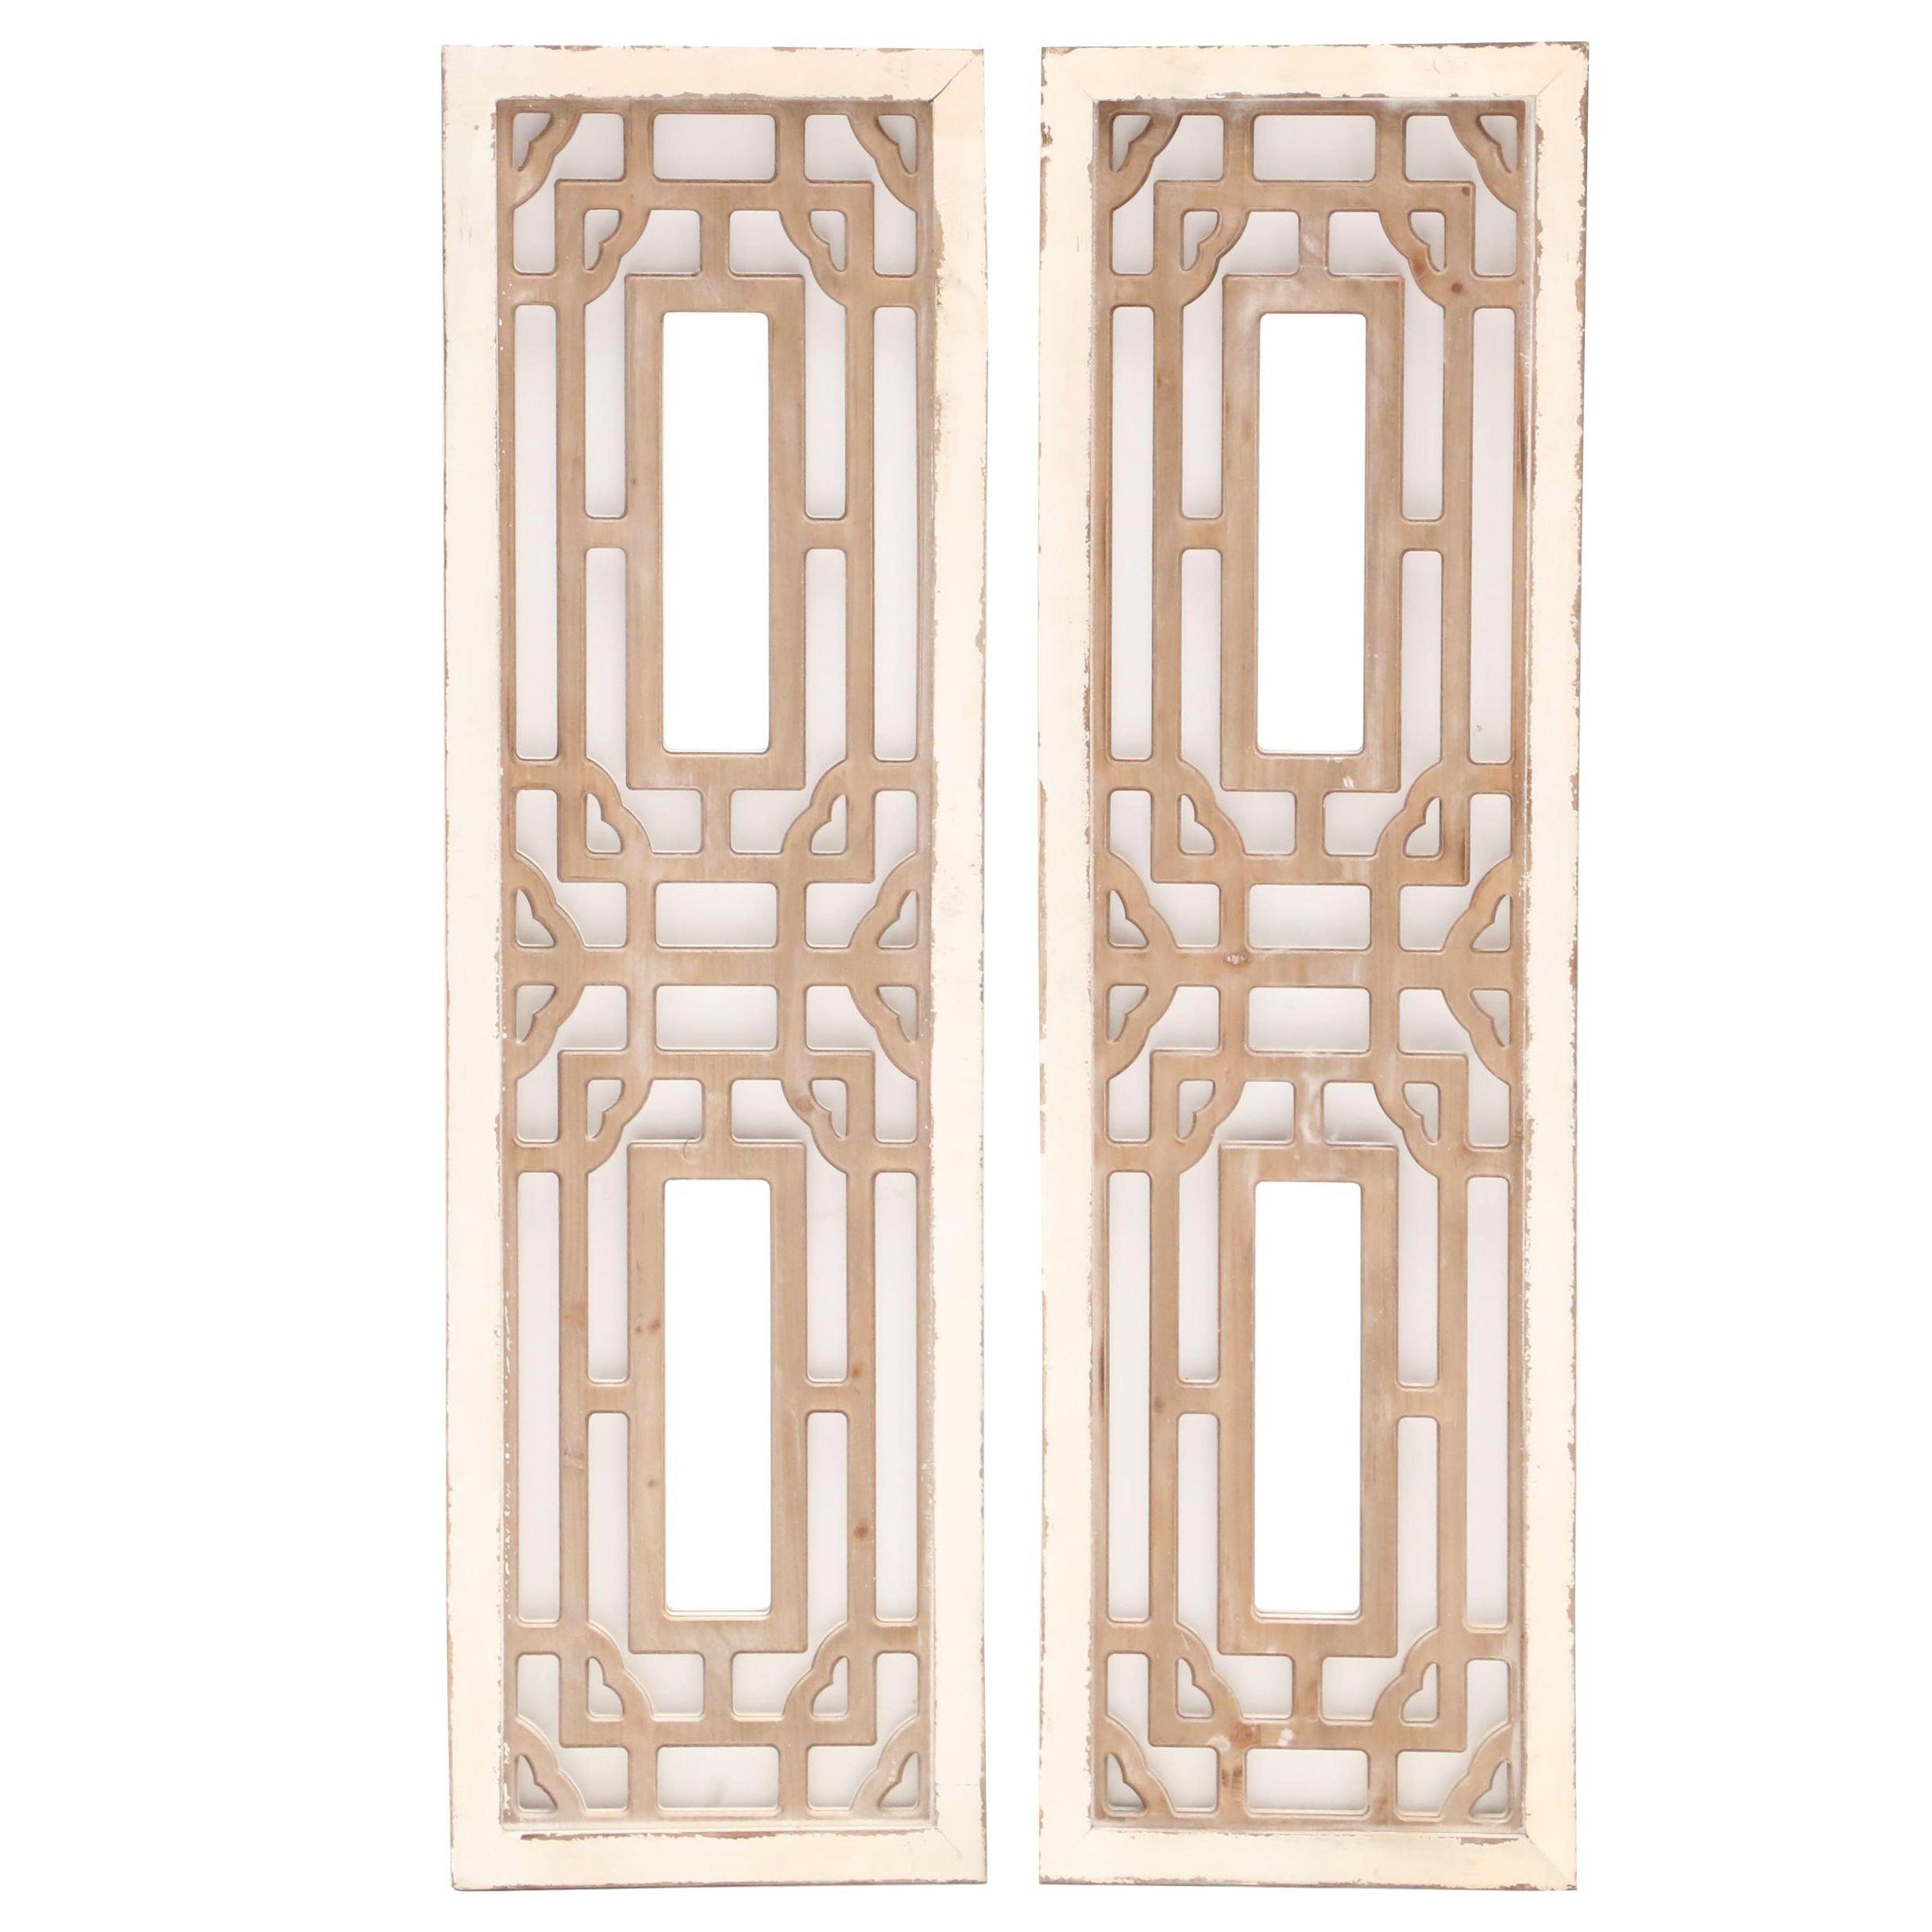 Decorative Mirrored Wall Panels by Kirkland